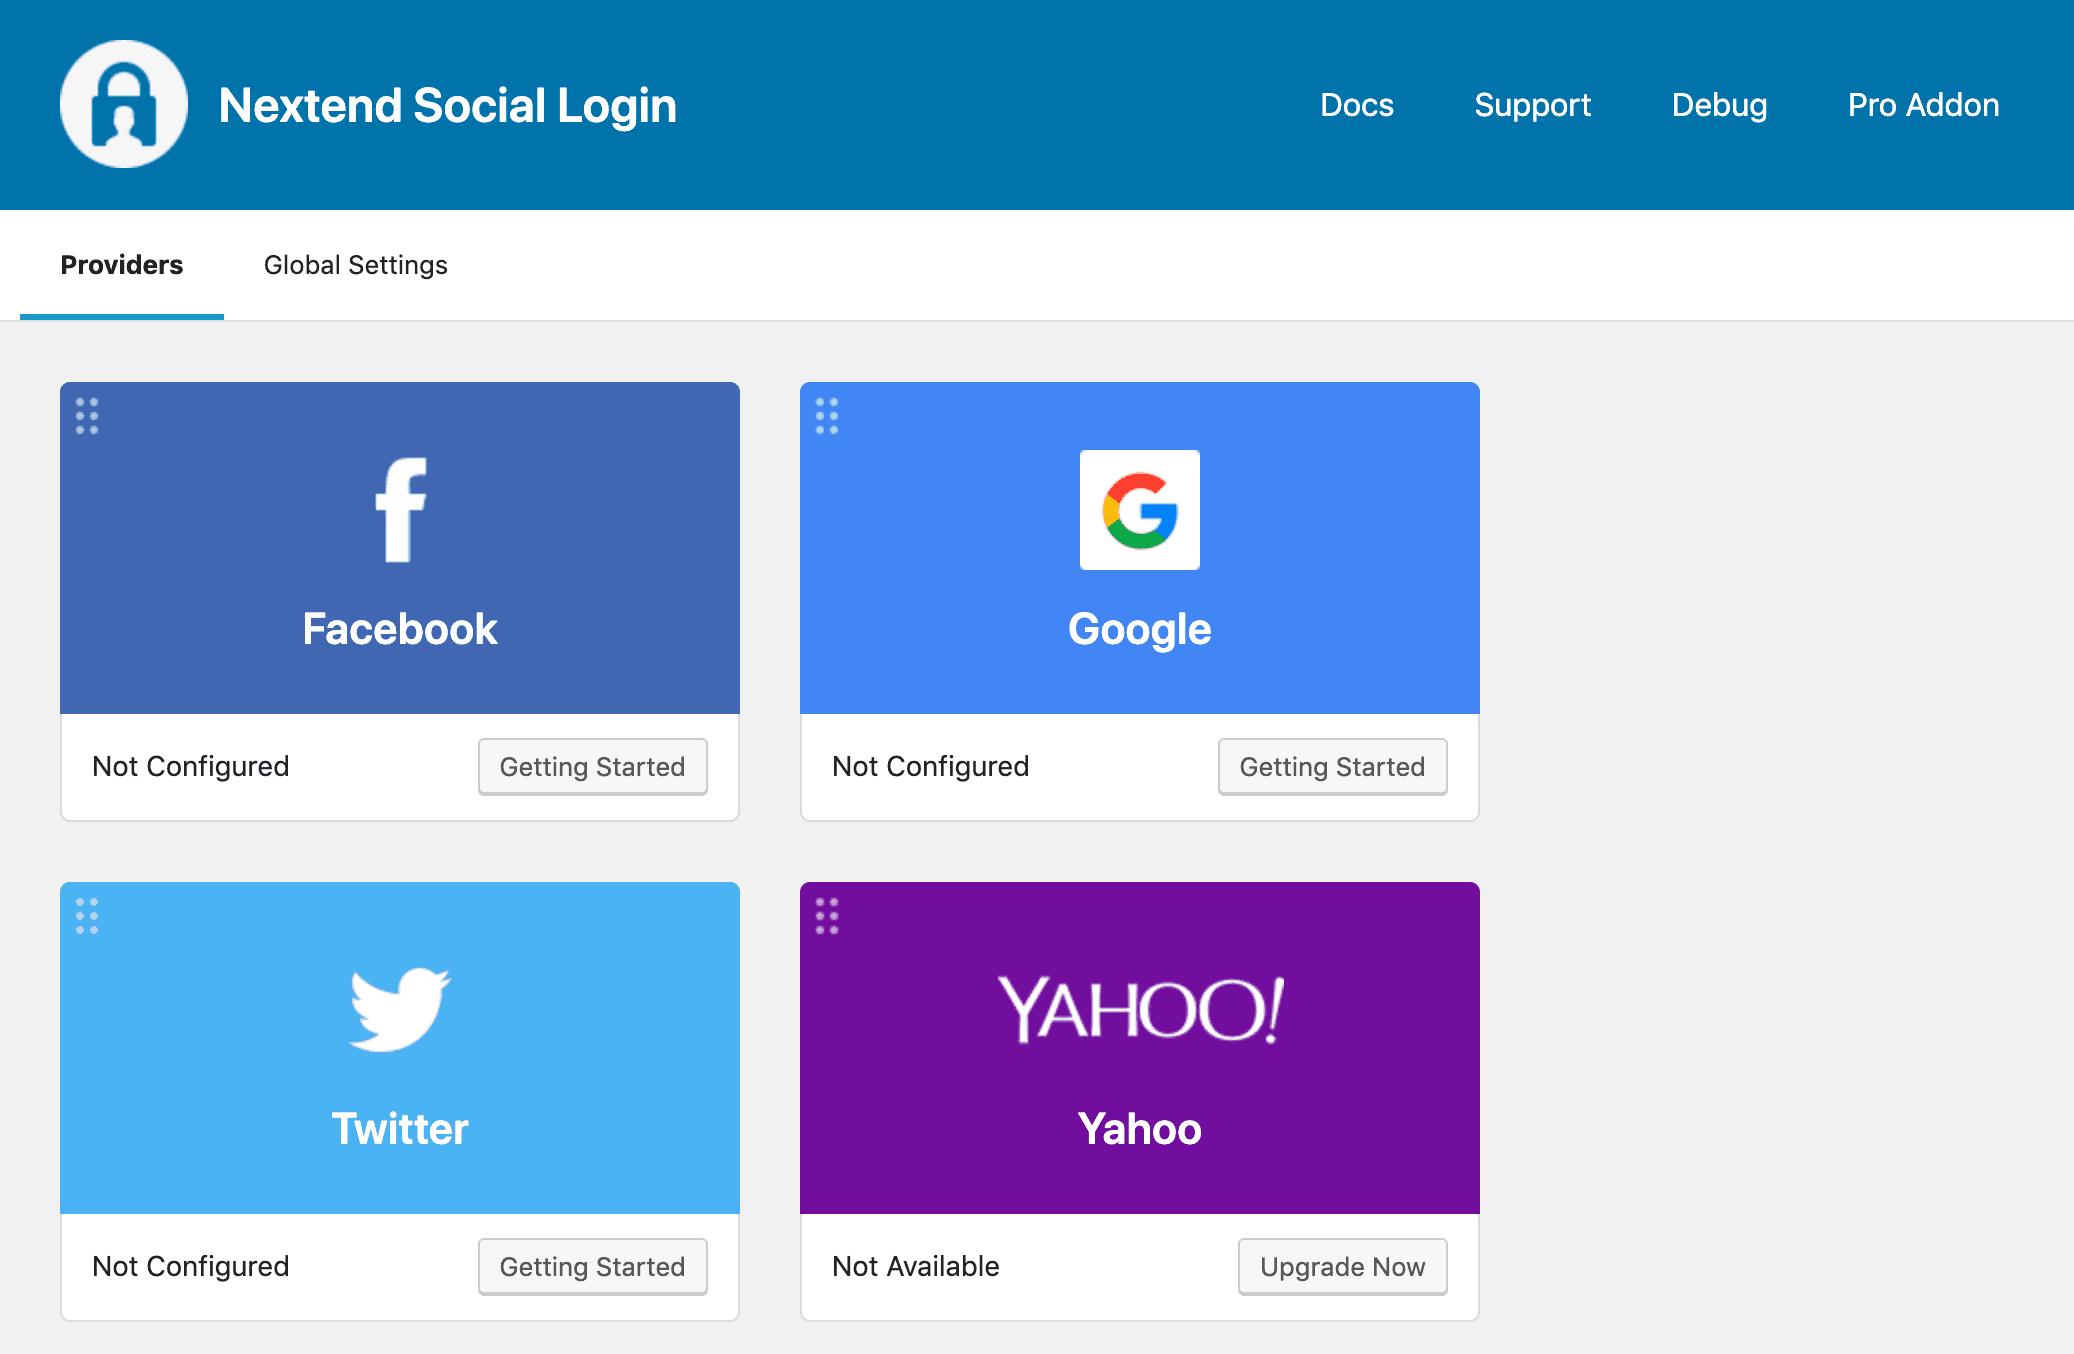 Nextend Social Login providers